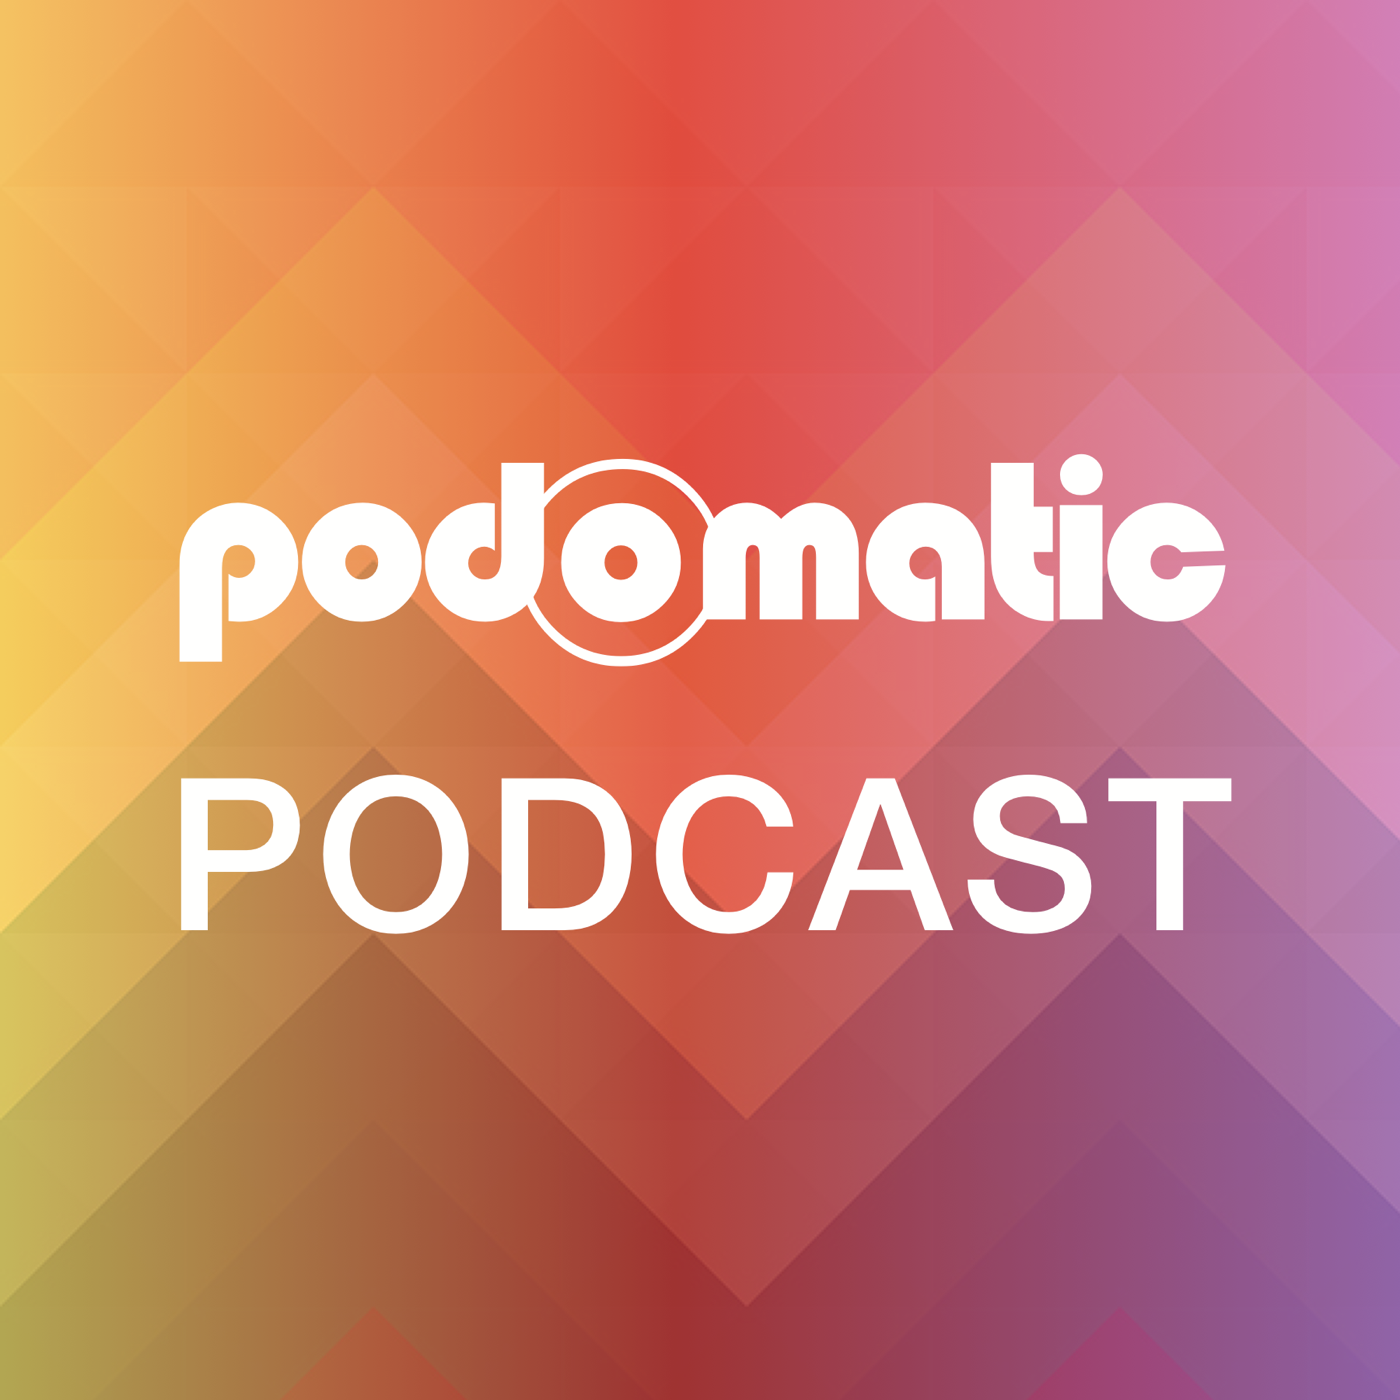 sam jelly's Podcast